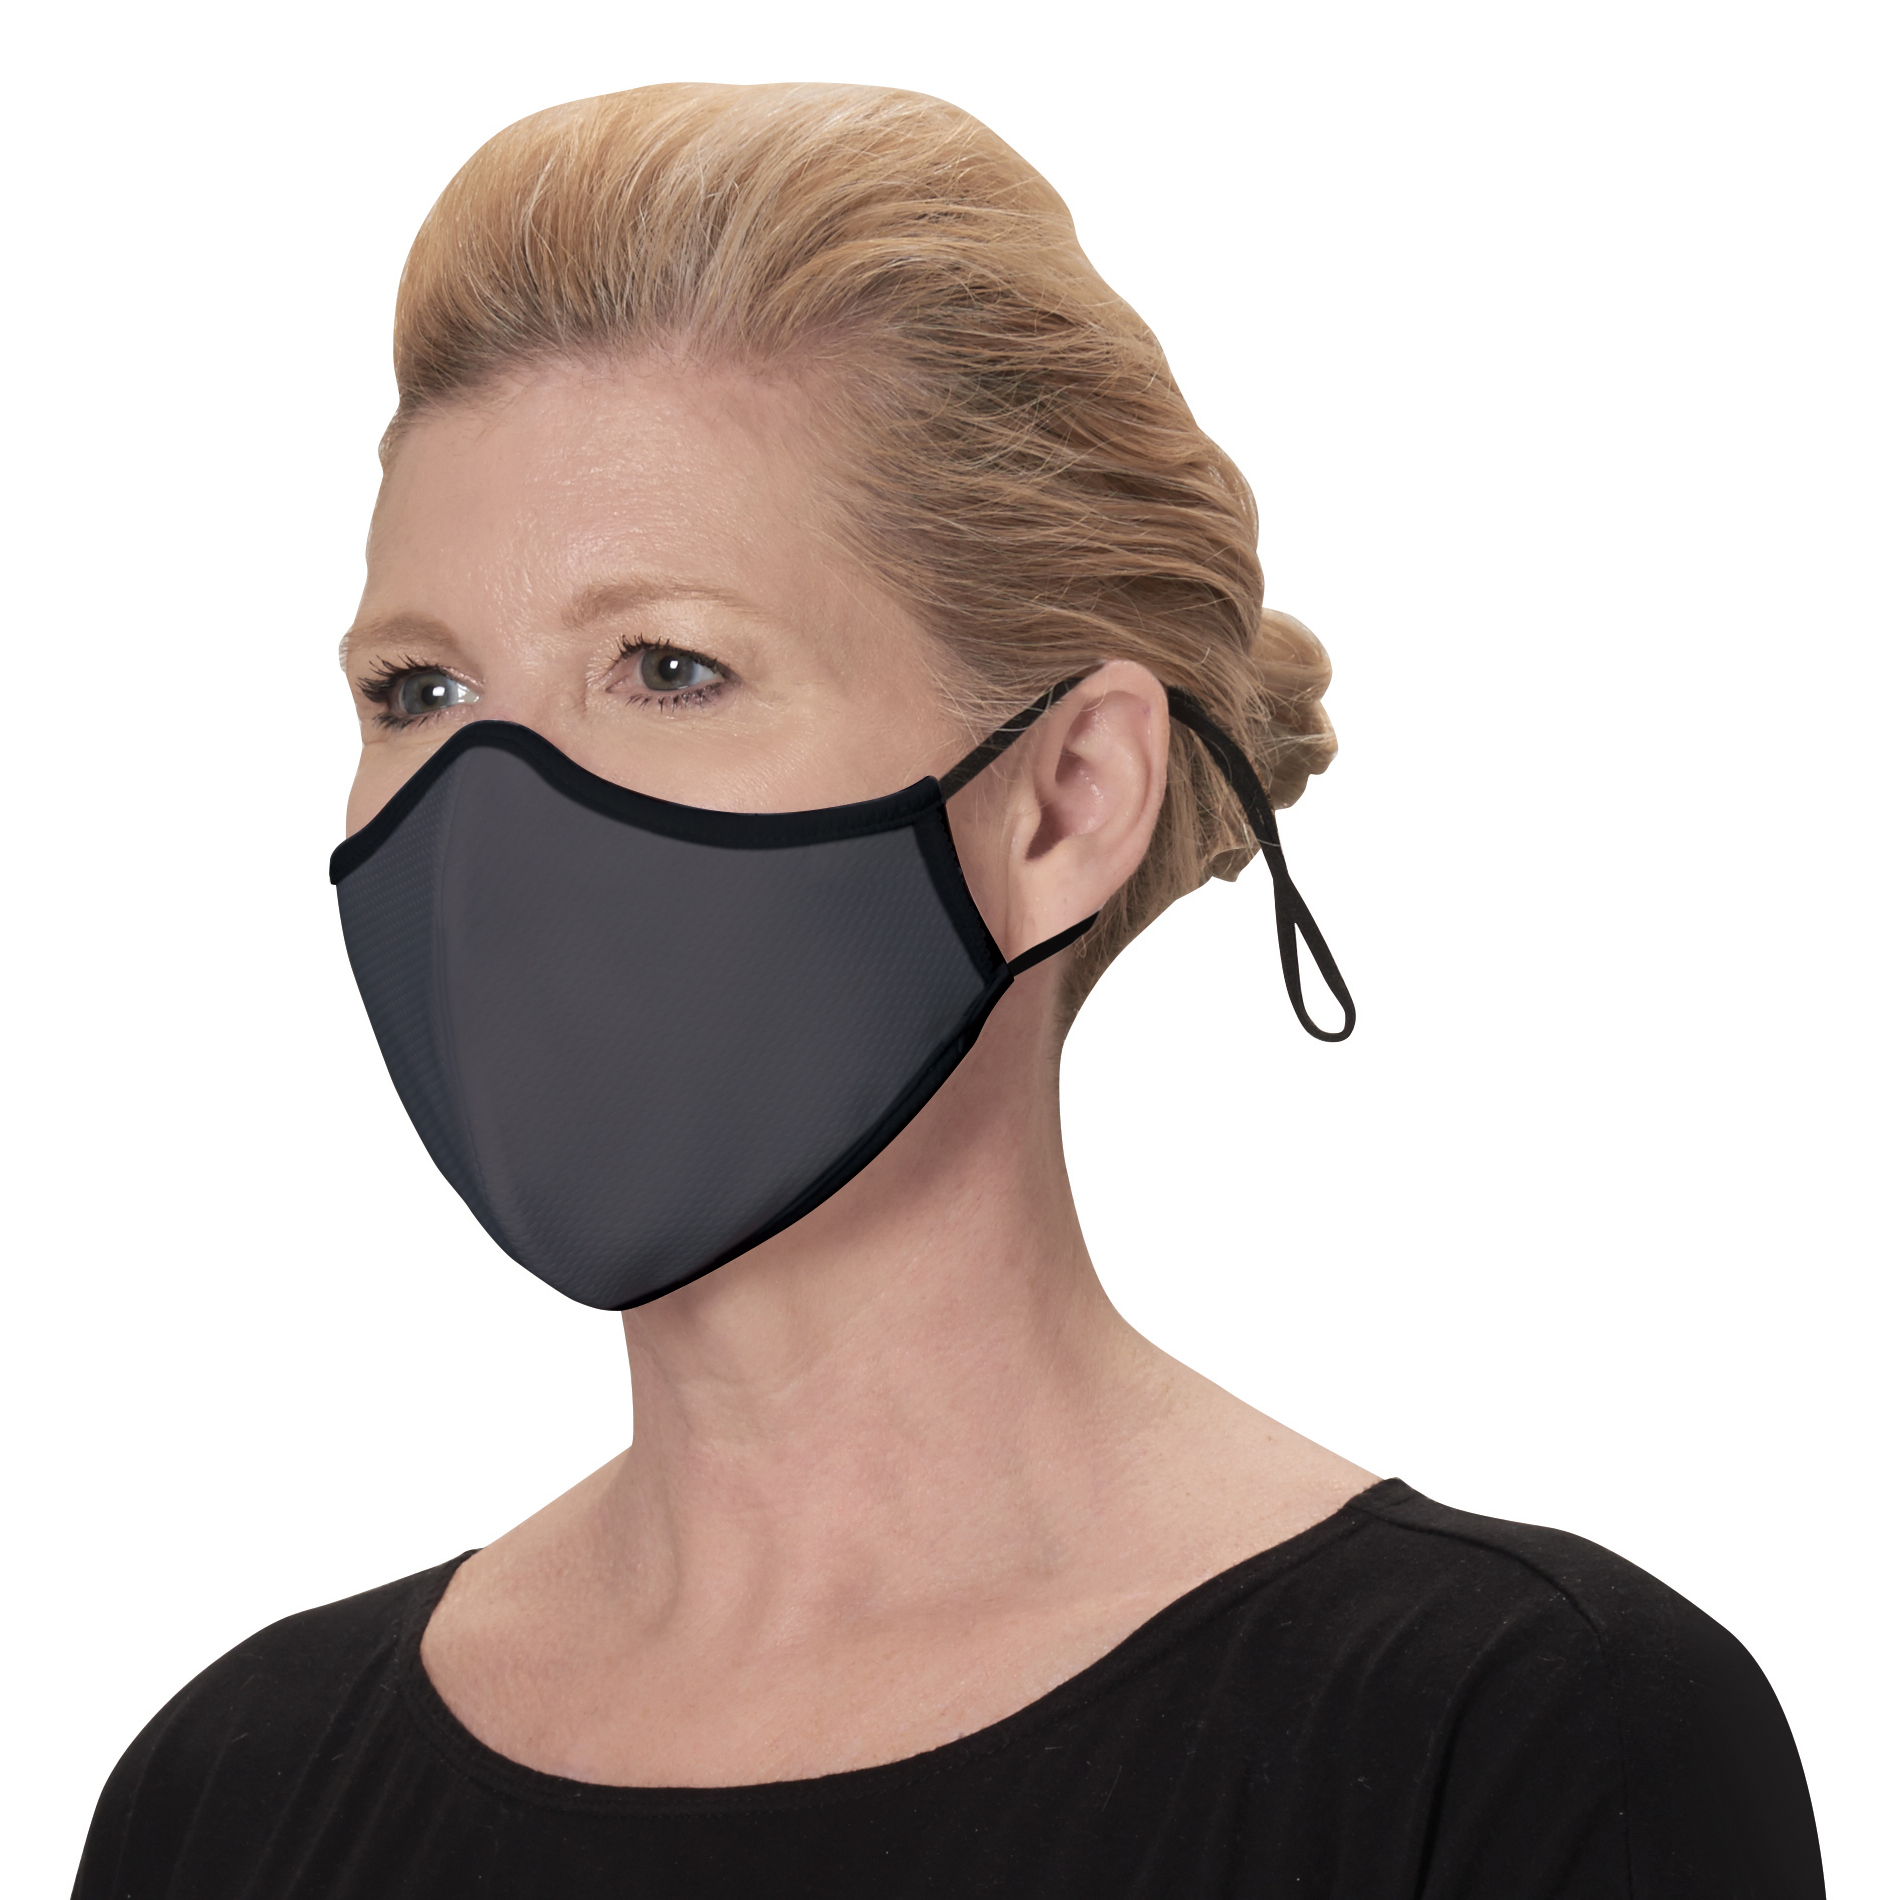 Winco MSK-4GML face mask